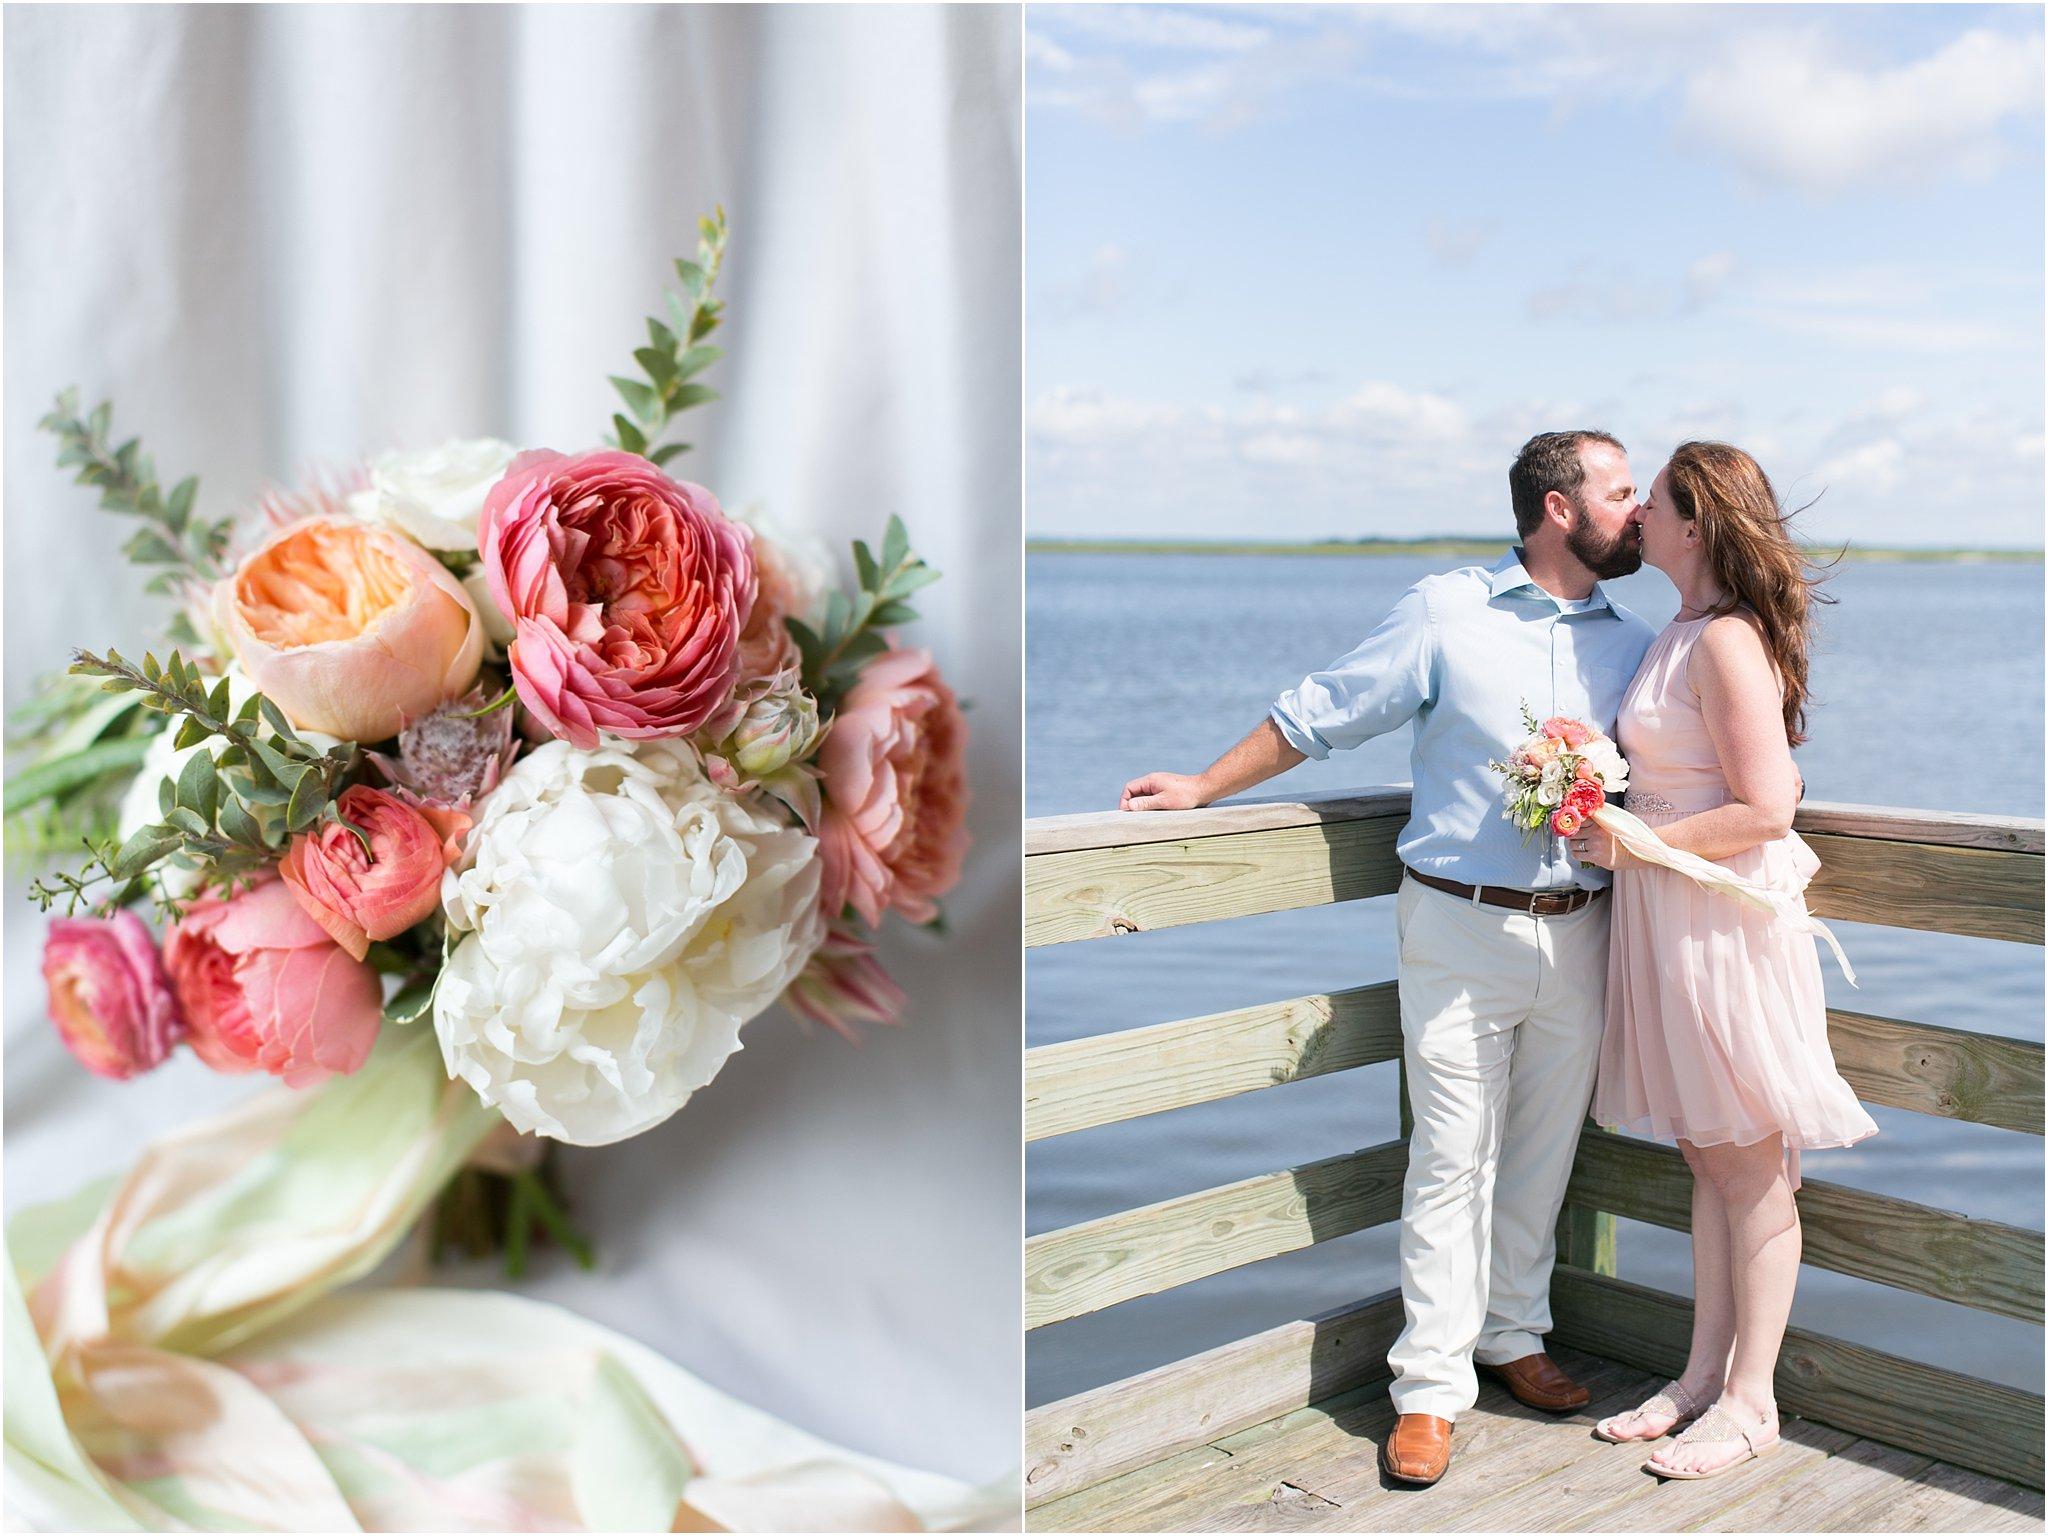 jessica_ryan_photography_wedding_photography_virginiabeach_virginia_candid_authentic_wedding_florida_wedding_photographer_amelia_island_fernandina_beach_1977